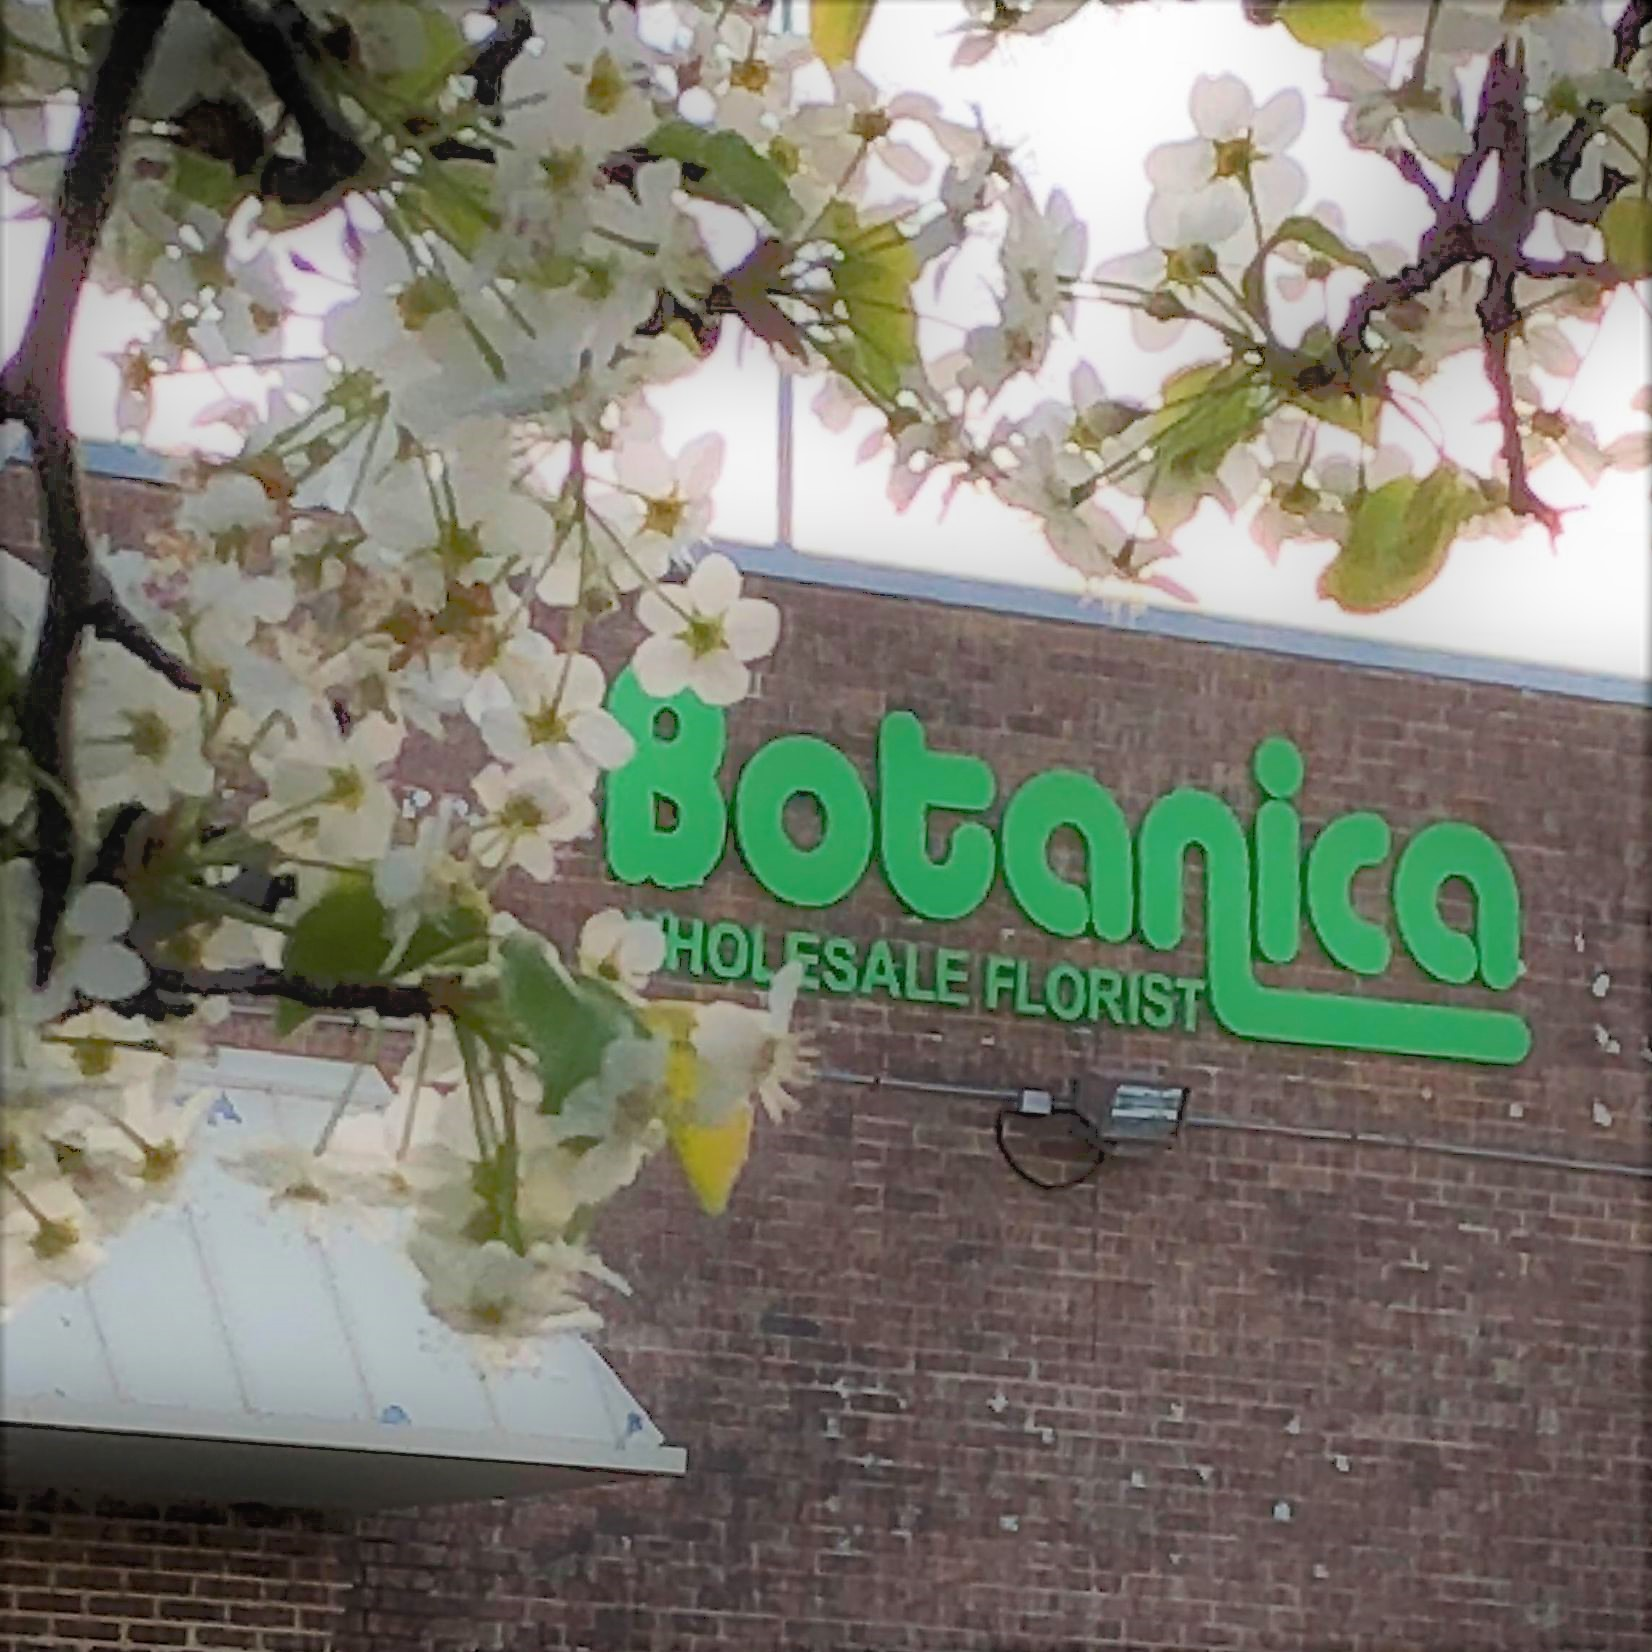 Botanica Front Face